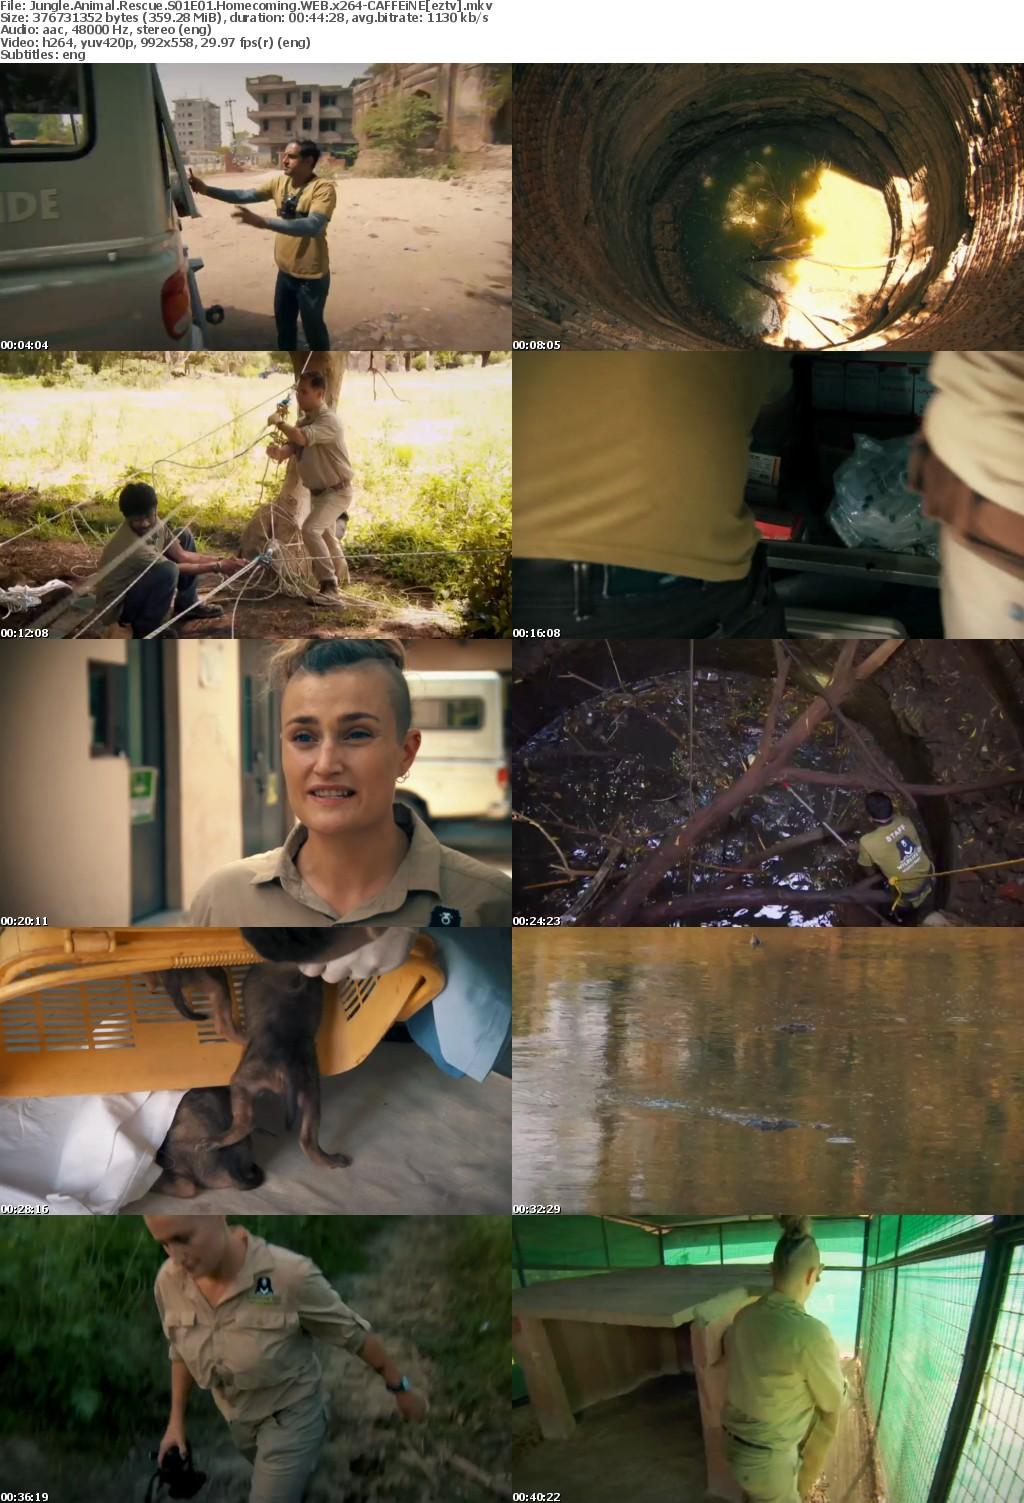 Jungle Animal Rescue S01E01 Homecoming WEB x264-CAFFEiNE